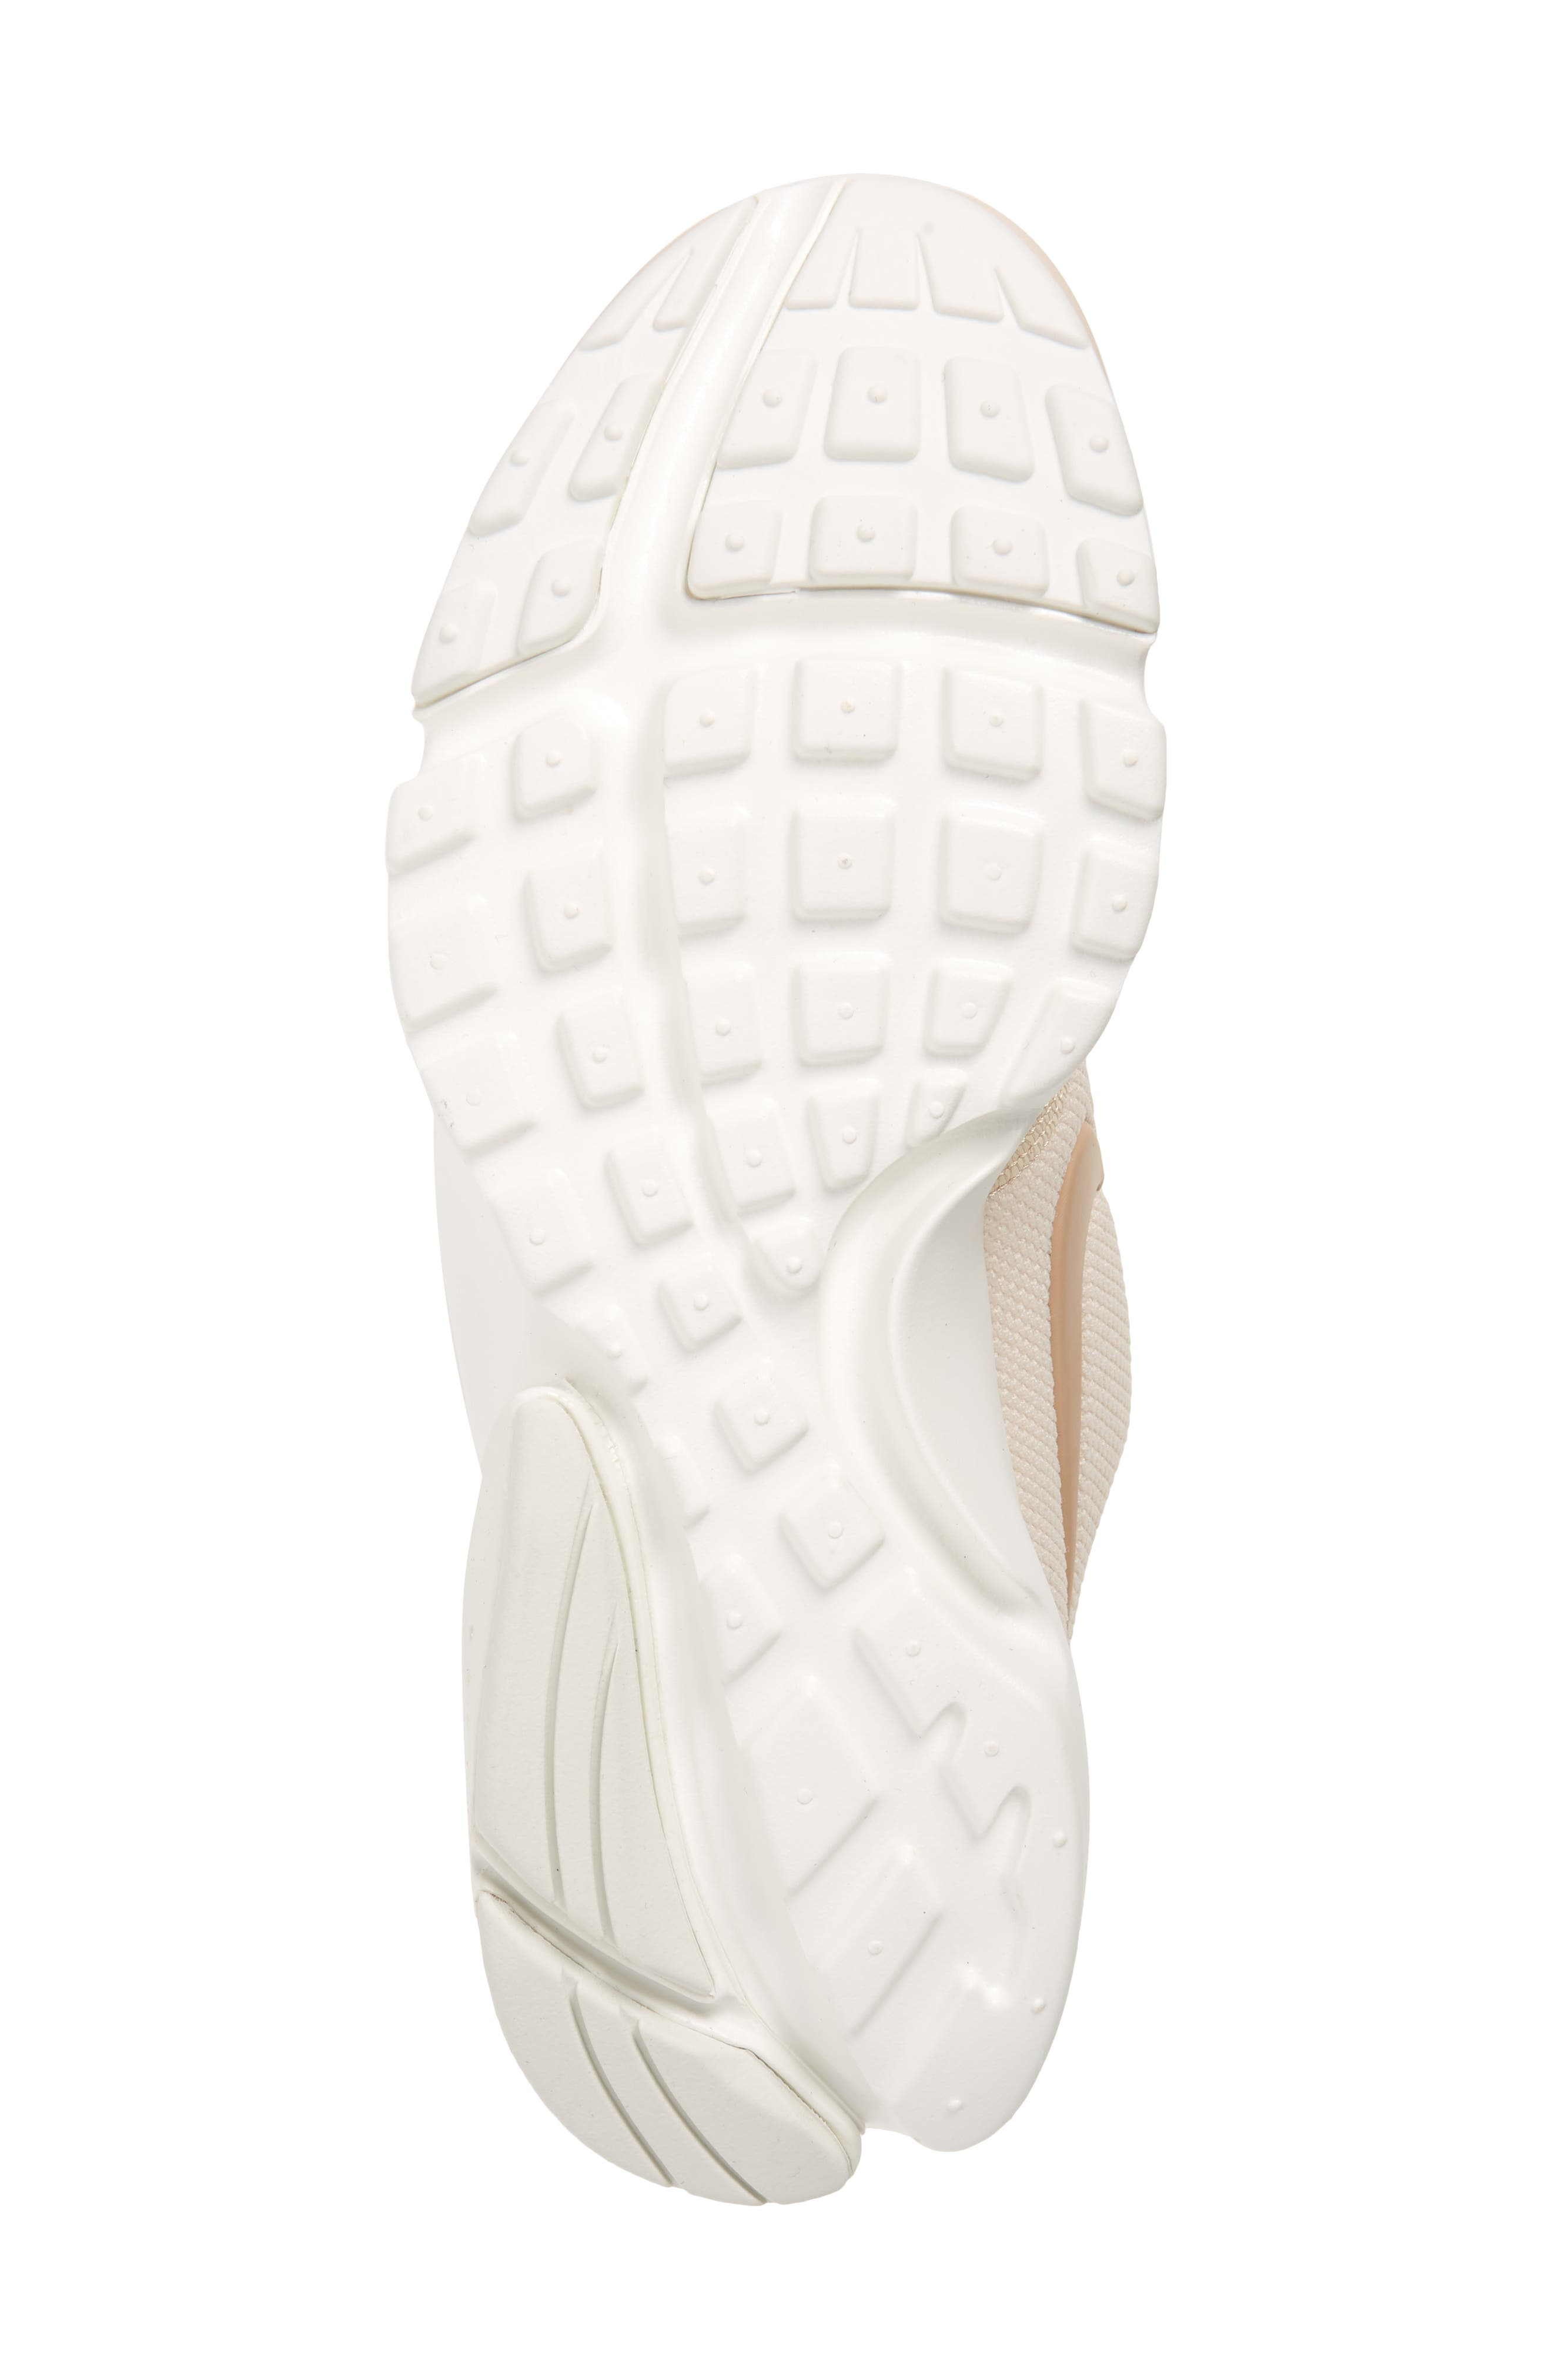 Presto Fly Sneaker,                             Alternate thumbnail 3, color,                             Guava Ice/ Beige/ Summit White